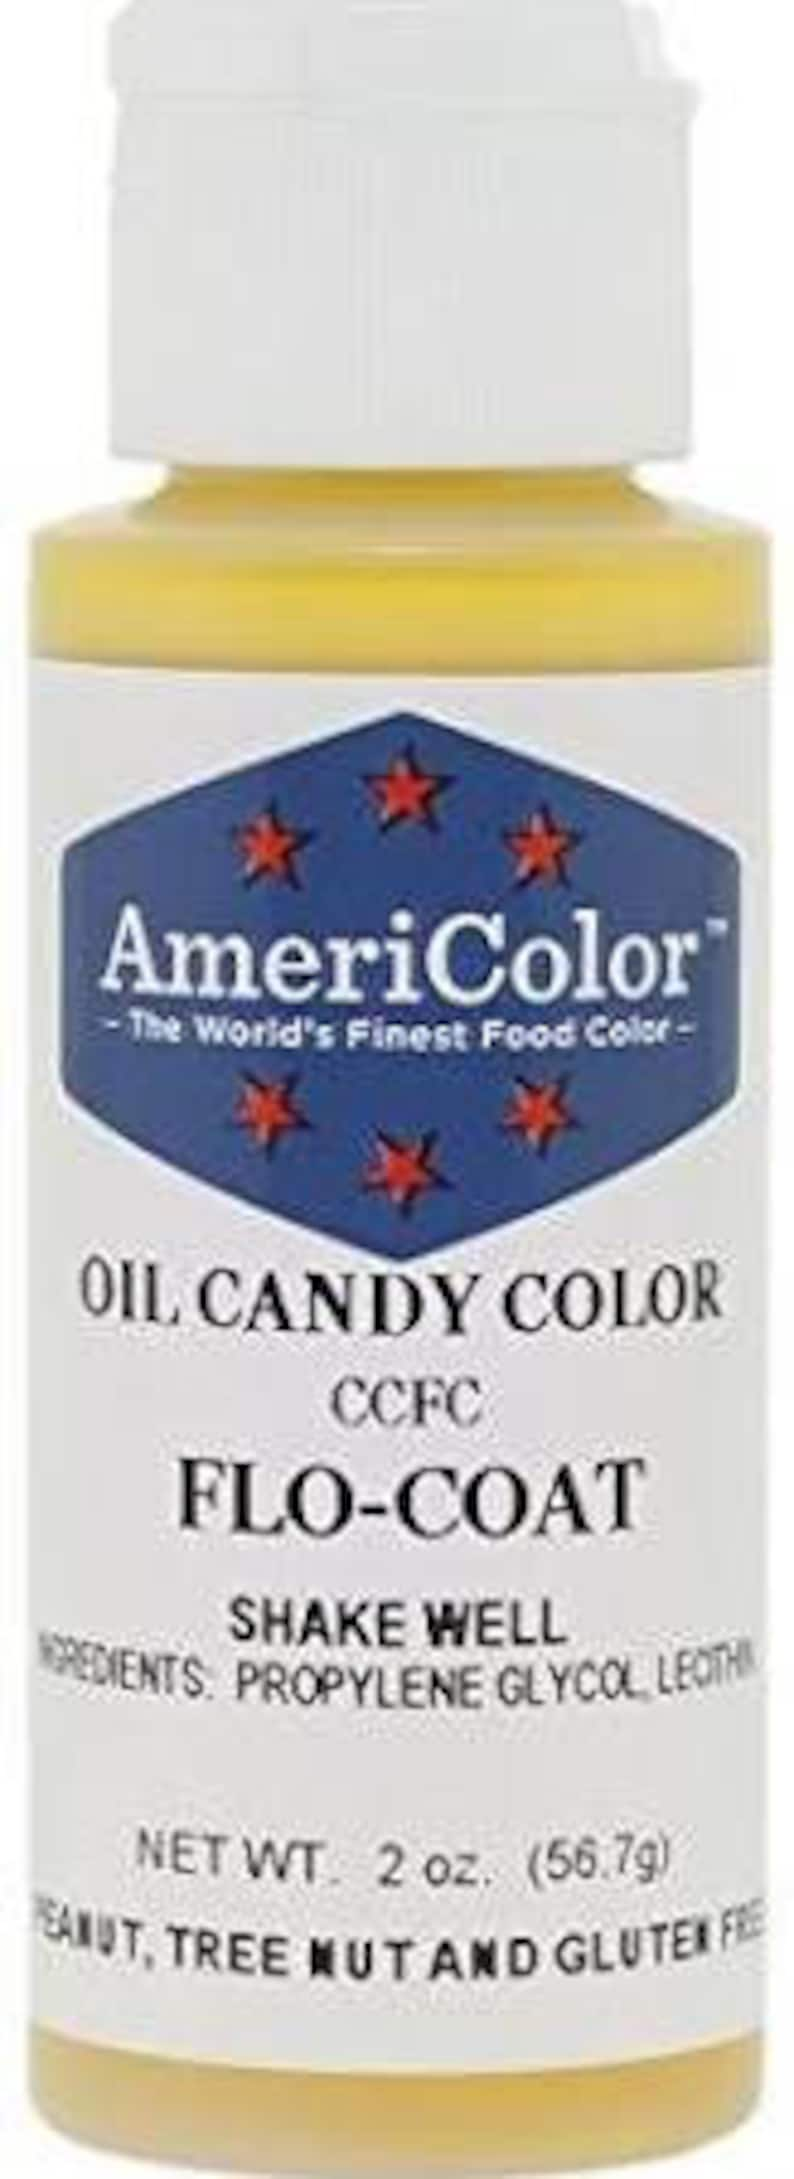 Flo-Coat Chocolate Coloring/DYI How to Color Chocolate/Oil Candy Coloring  Agent/Chocolate Food Coloring Formula/ AmeriColor 2 oz Flo Coat